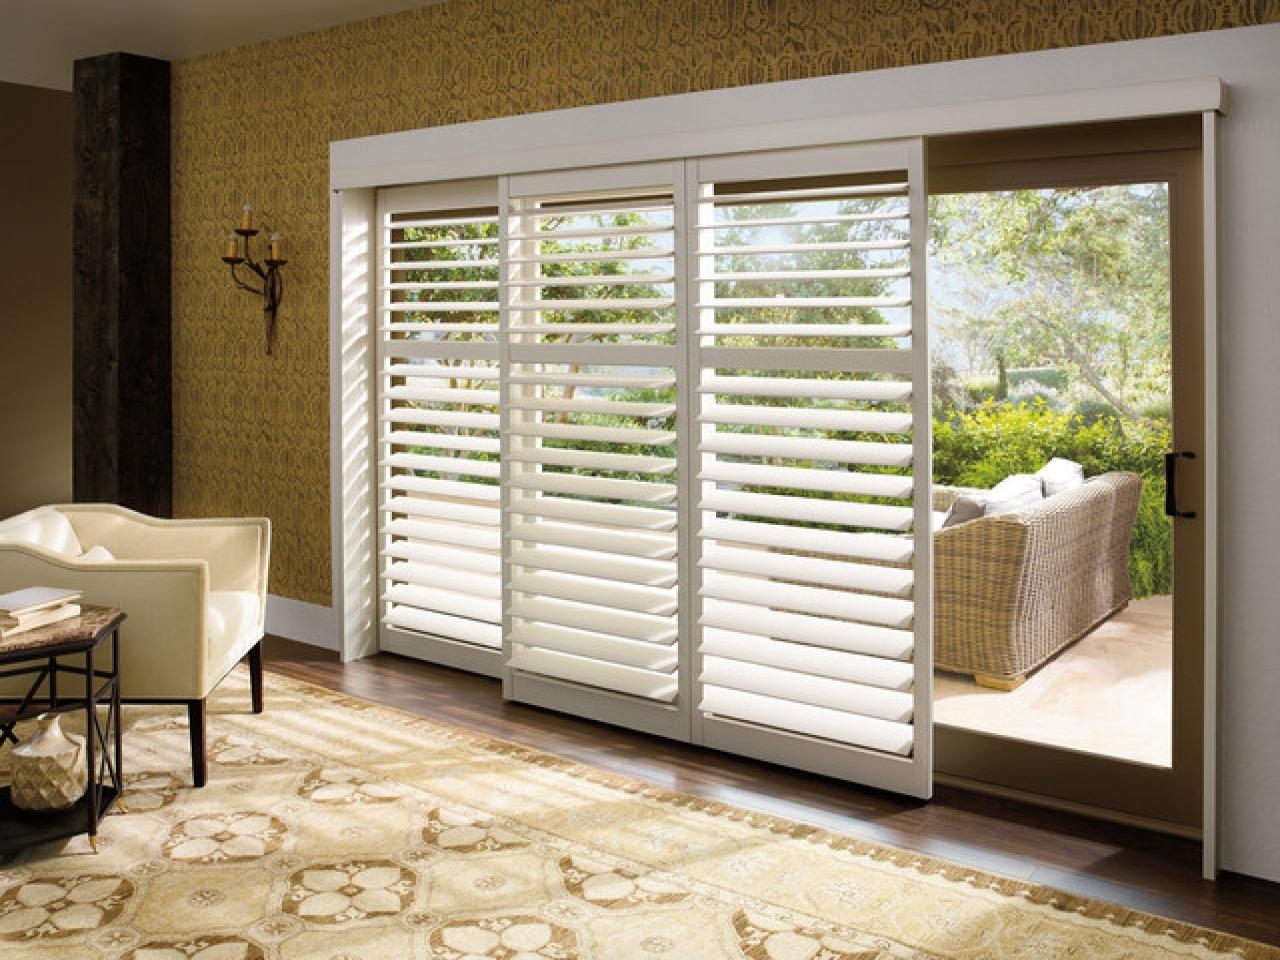 8 Foot Sliding Door Blindswindow treatments for sliding glass doors ideas tips